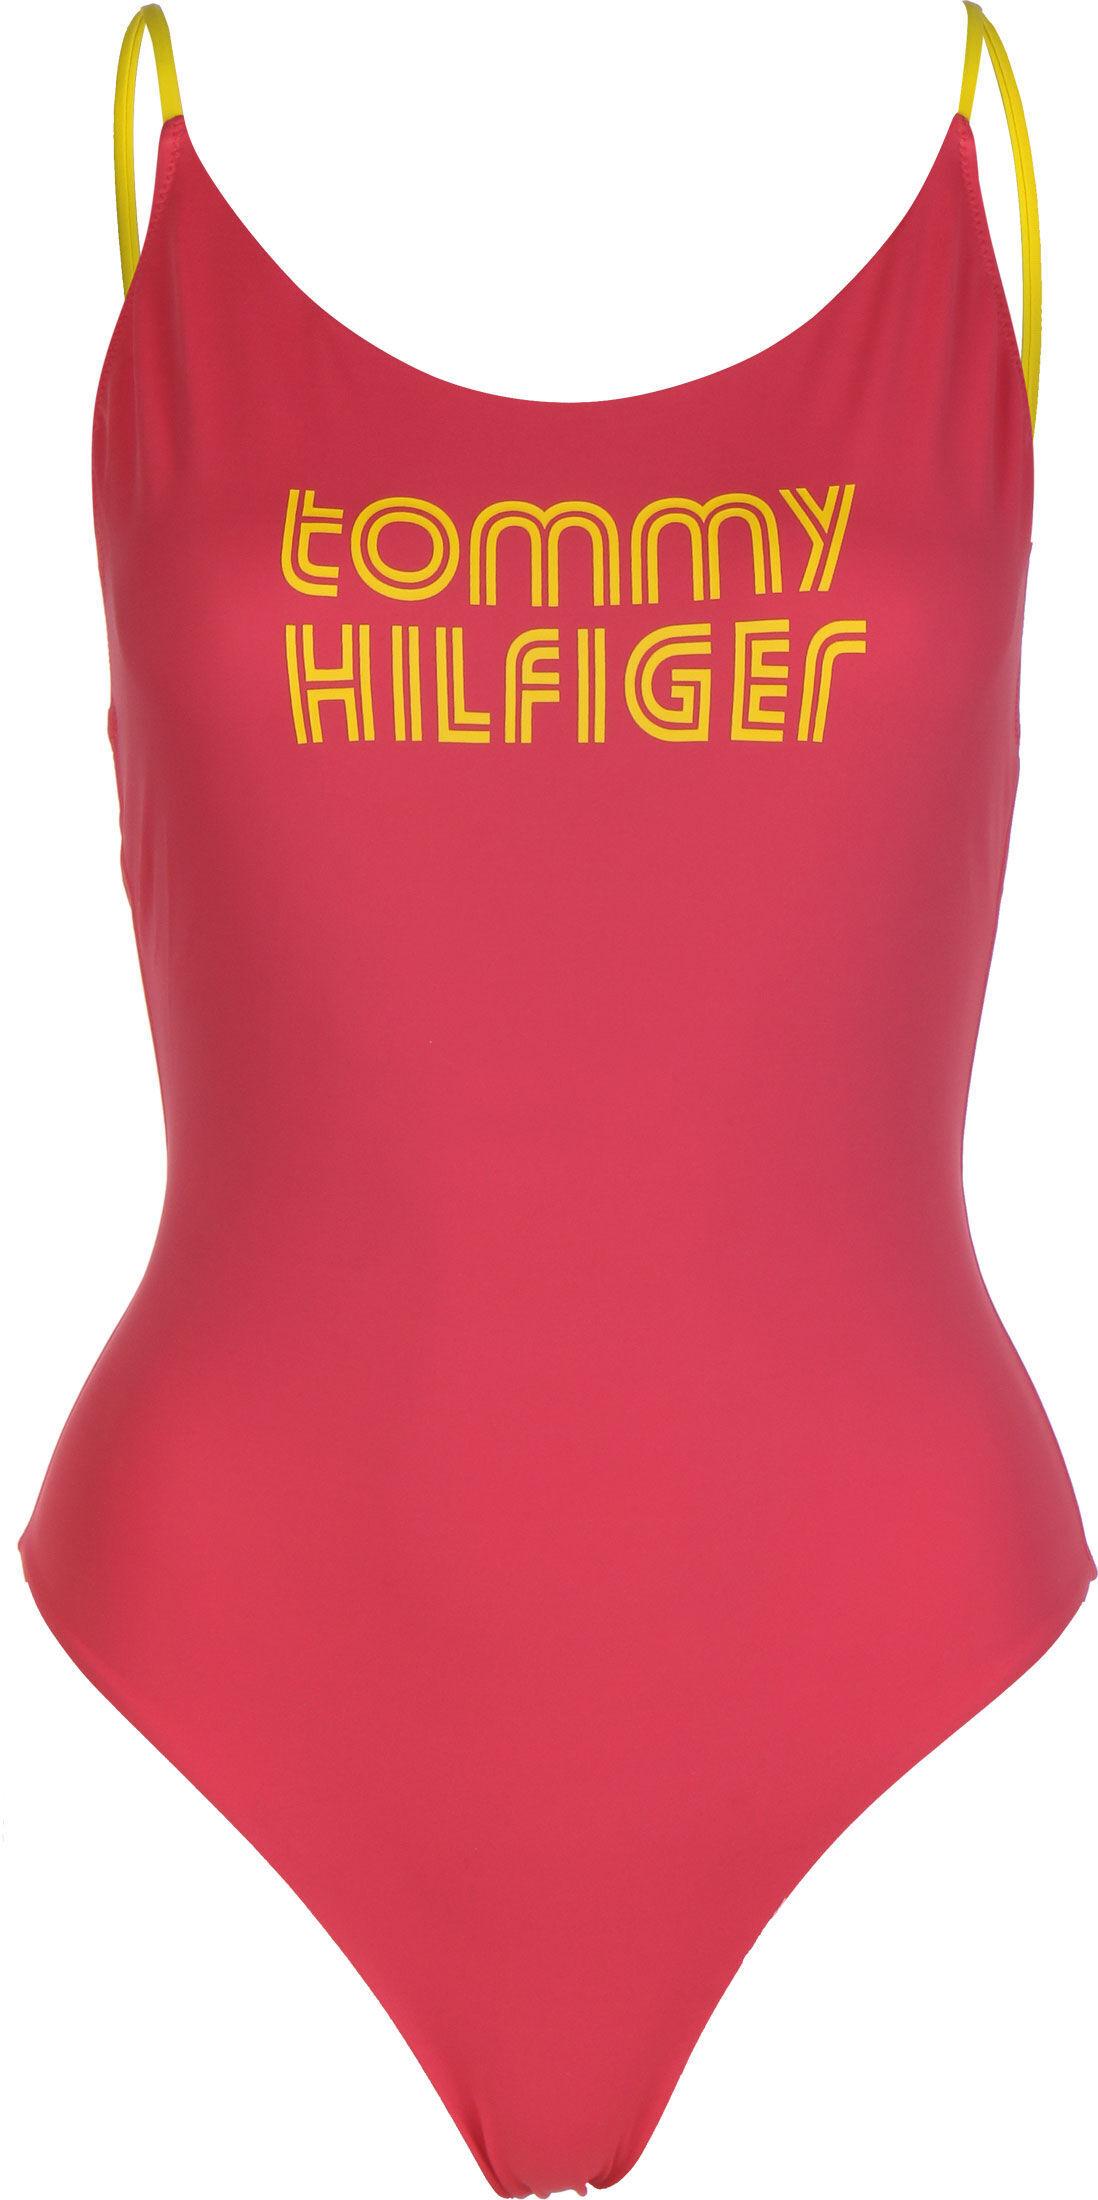 Tommy Hilfiger maillot de bain, L, femme rose